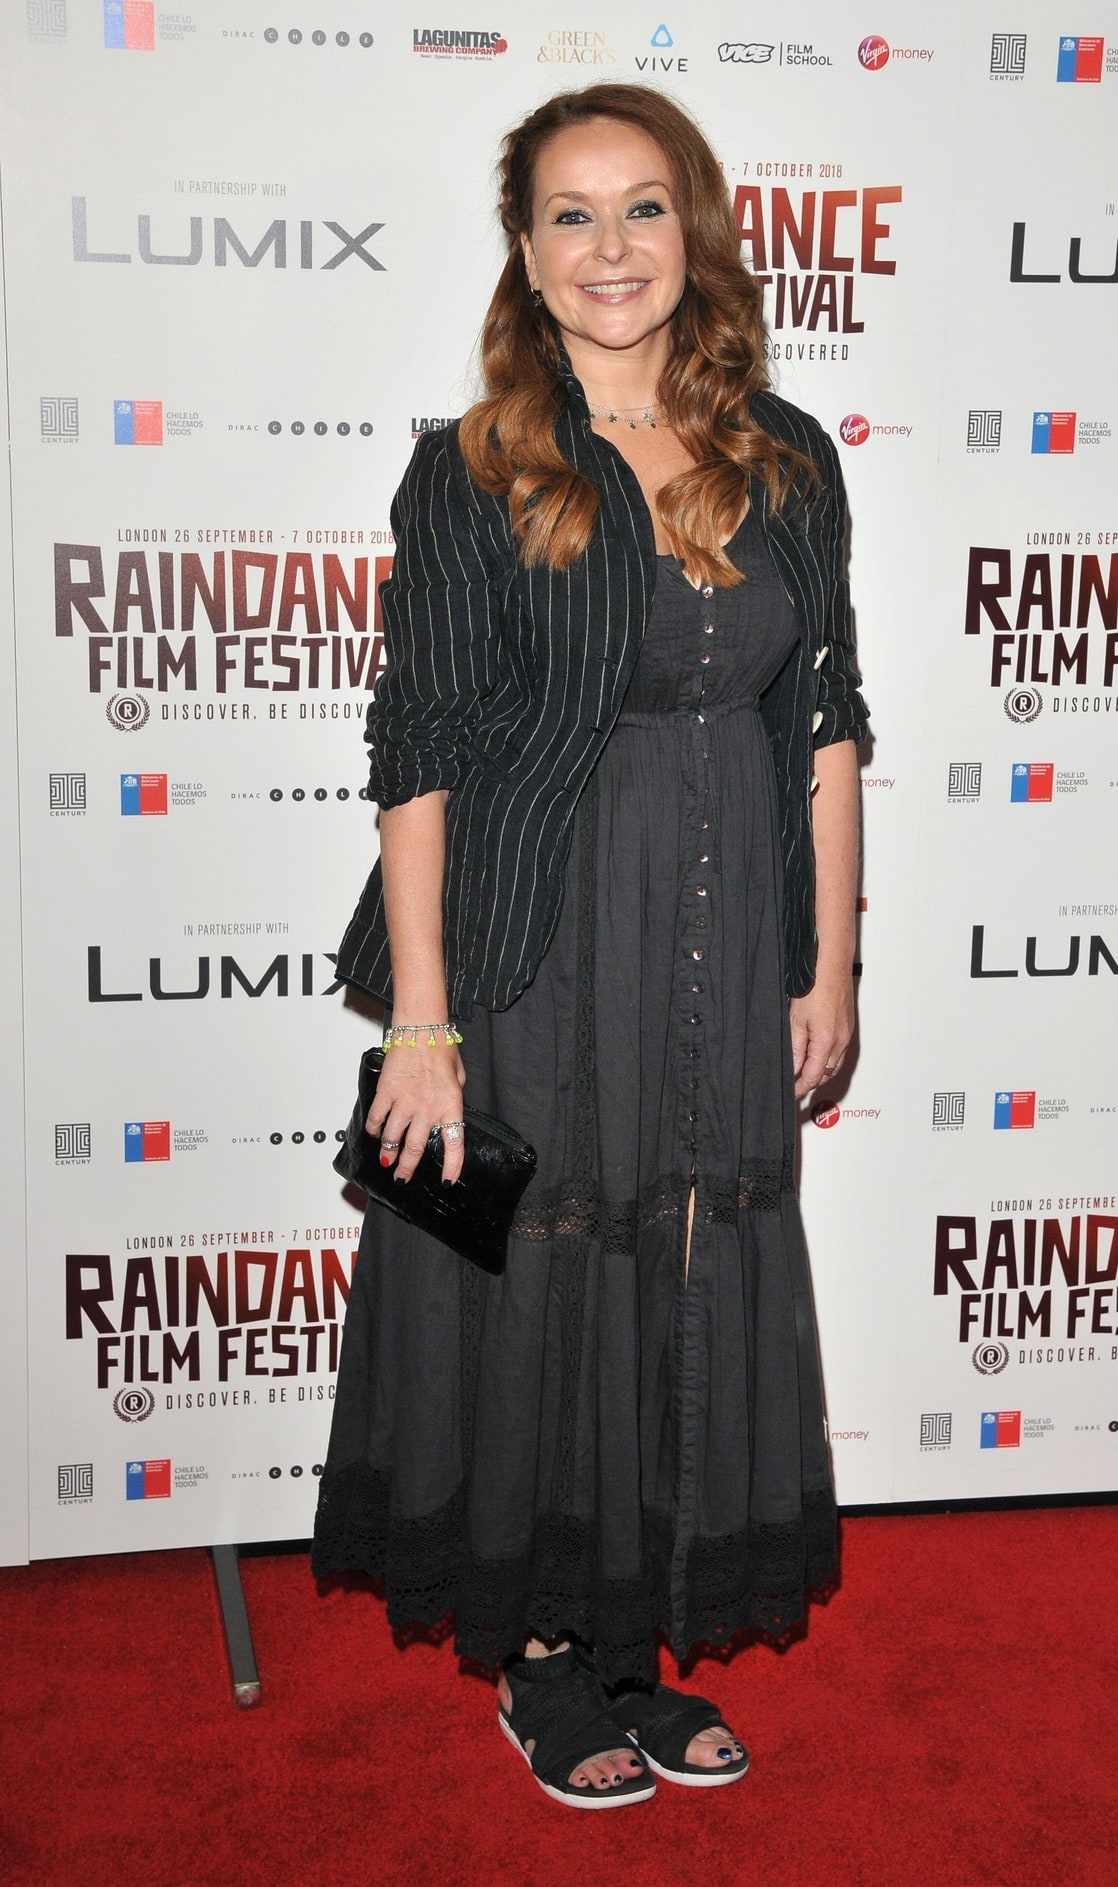 Tamsin Egerton (born 1988)